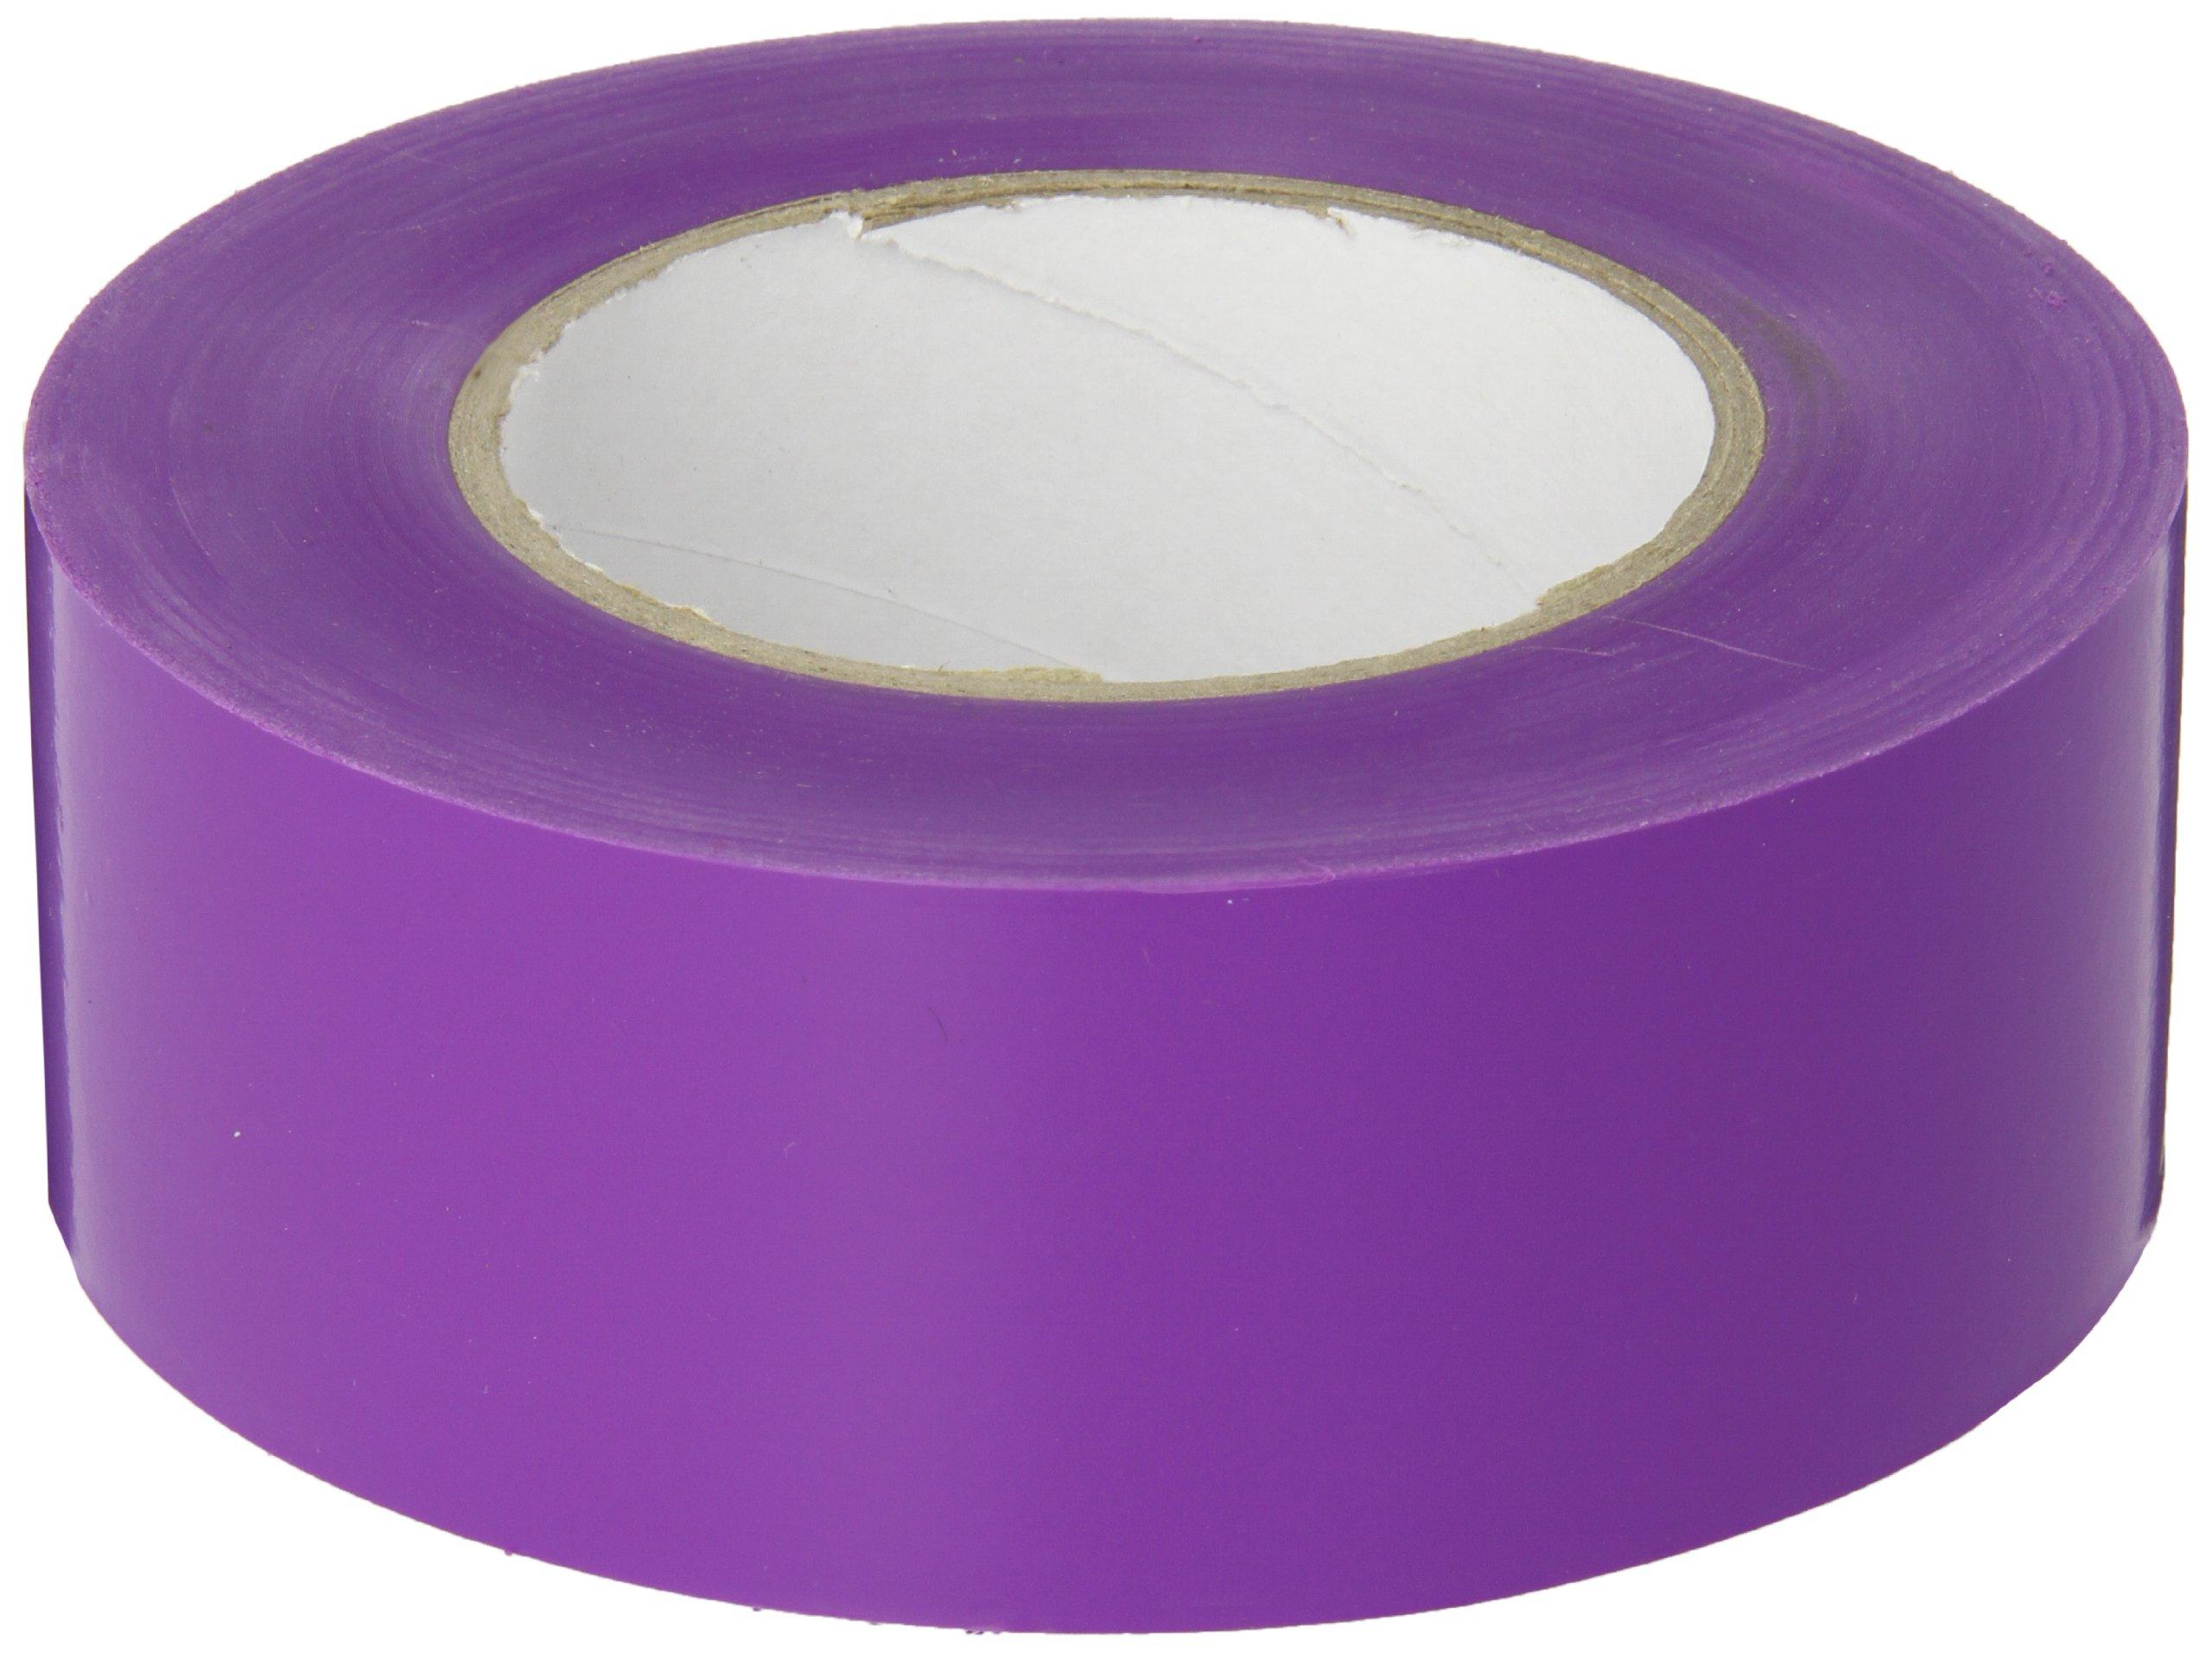 School Specialty Floor Marking Tape - 2 inches x 60 yards - Purple